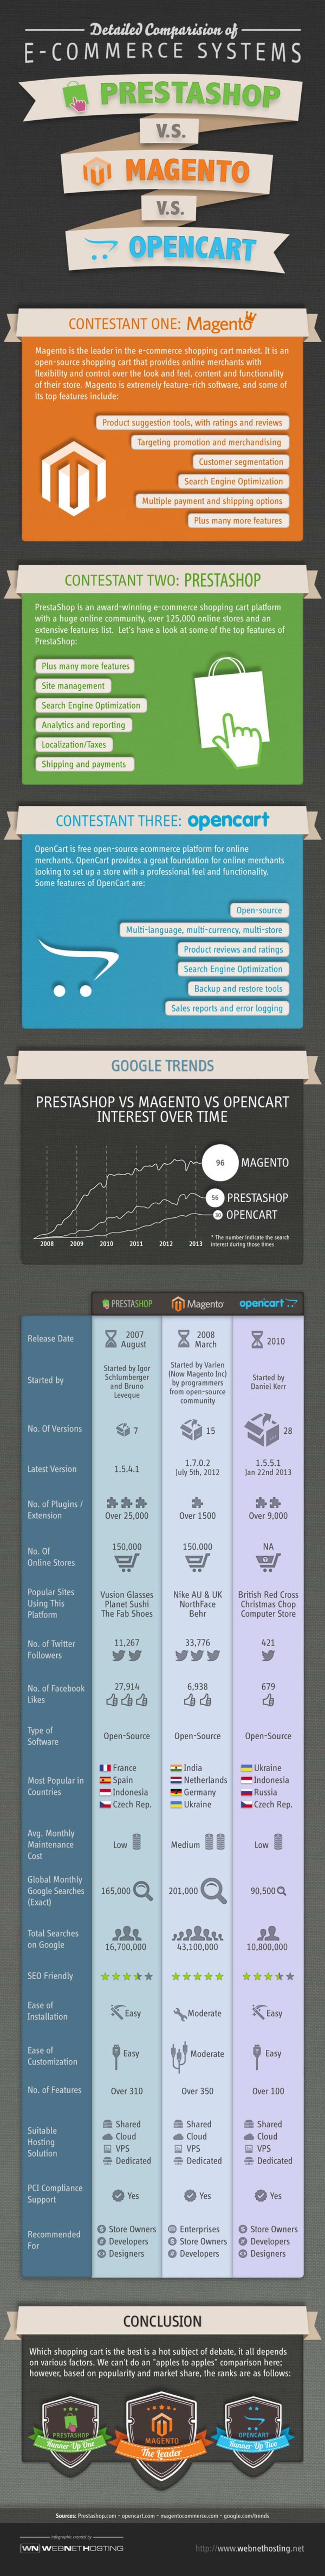 PrestaShop Vs OpenCart Vs Magento Comparison | The Webmaster